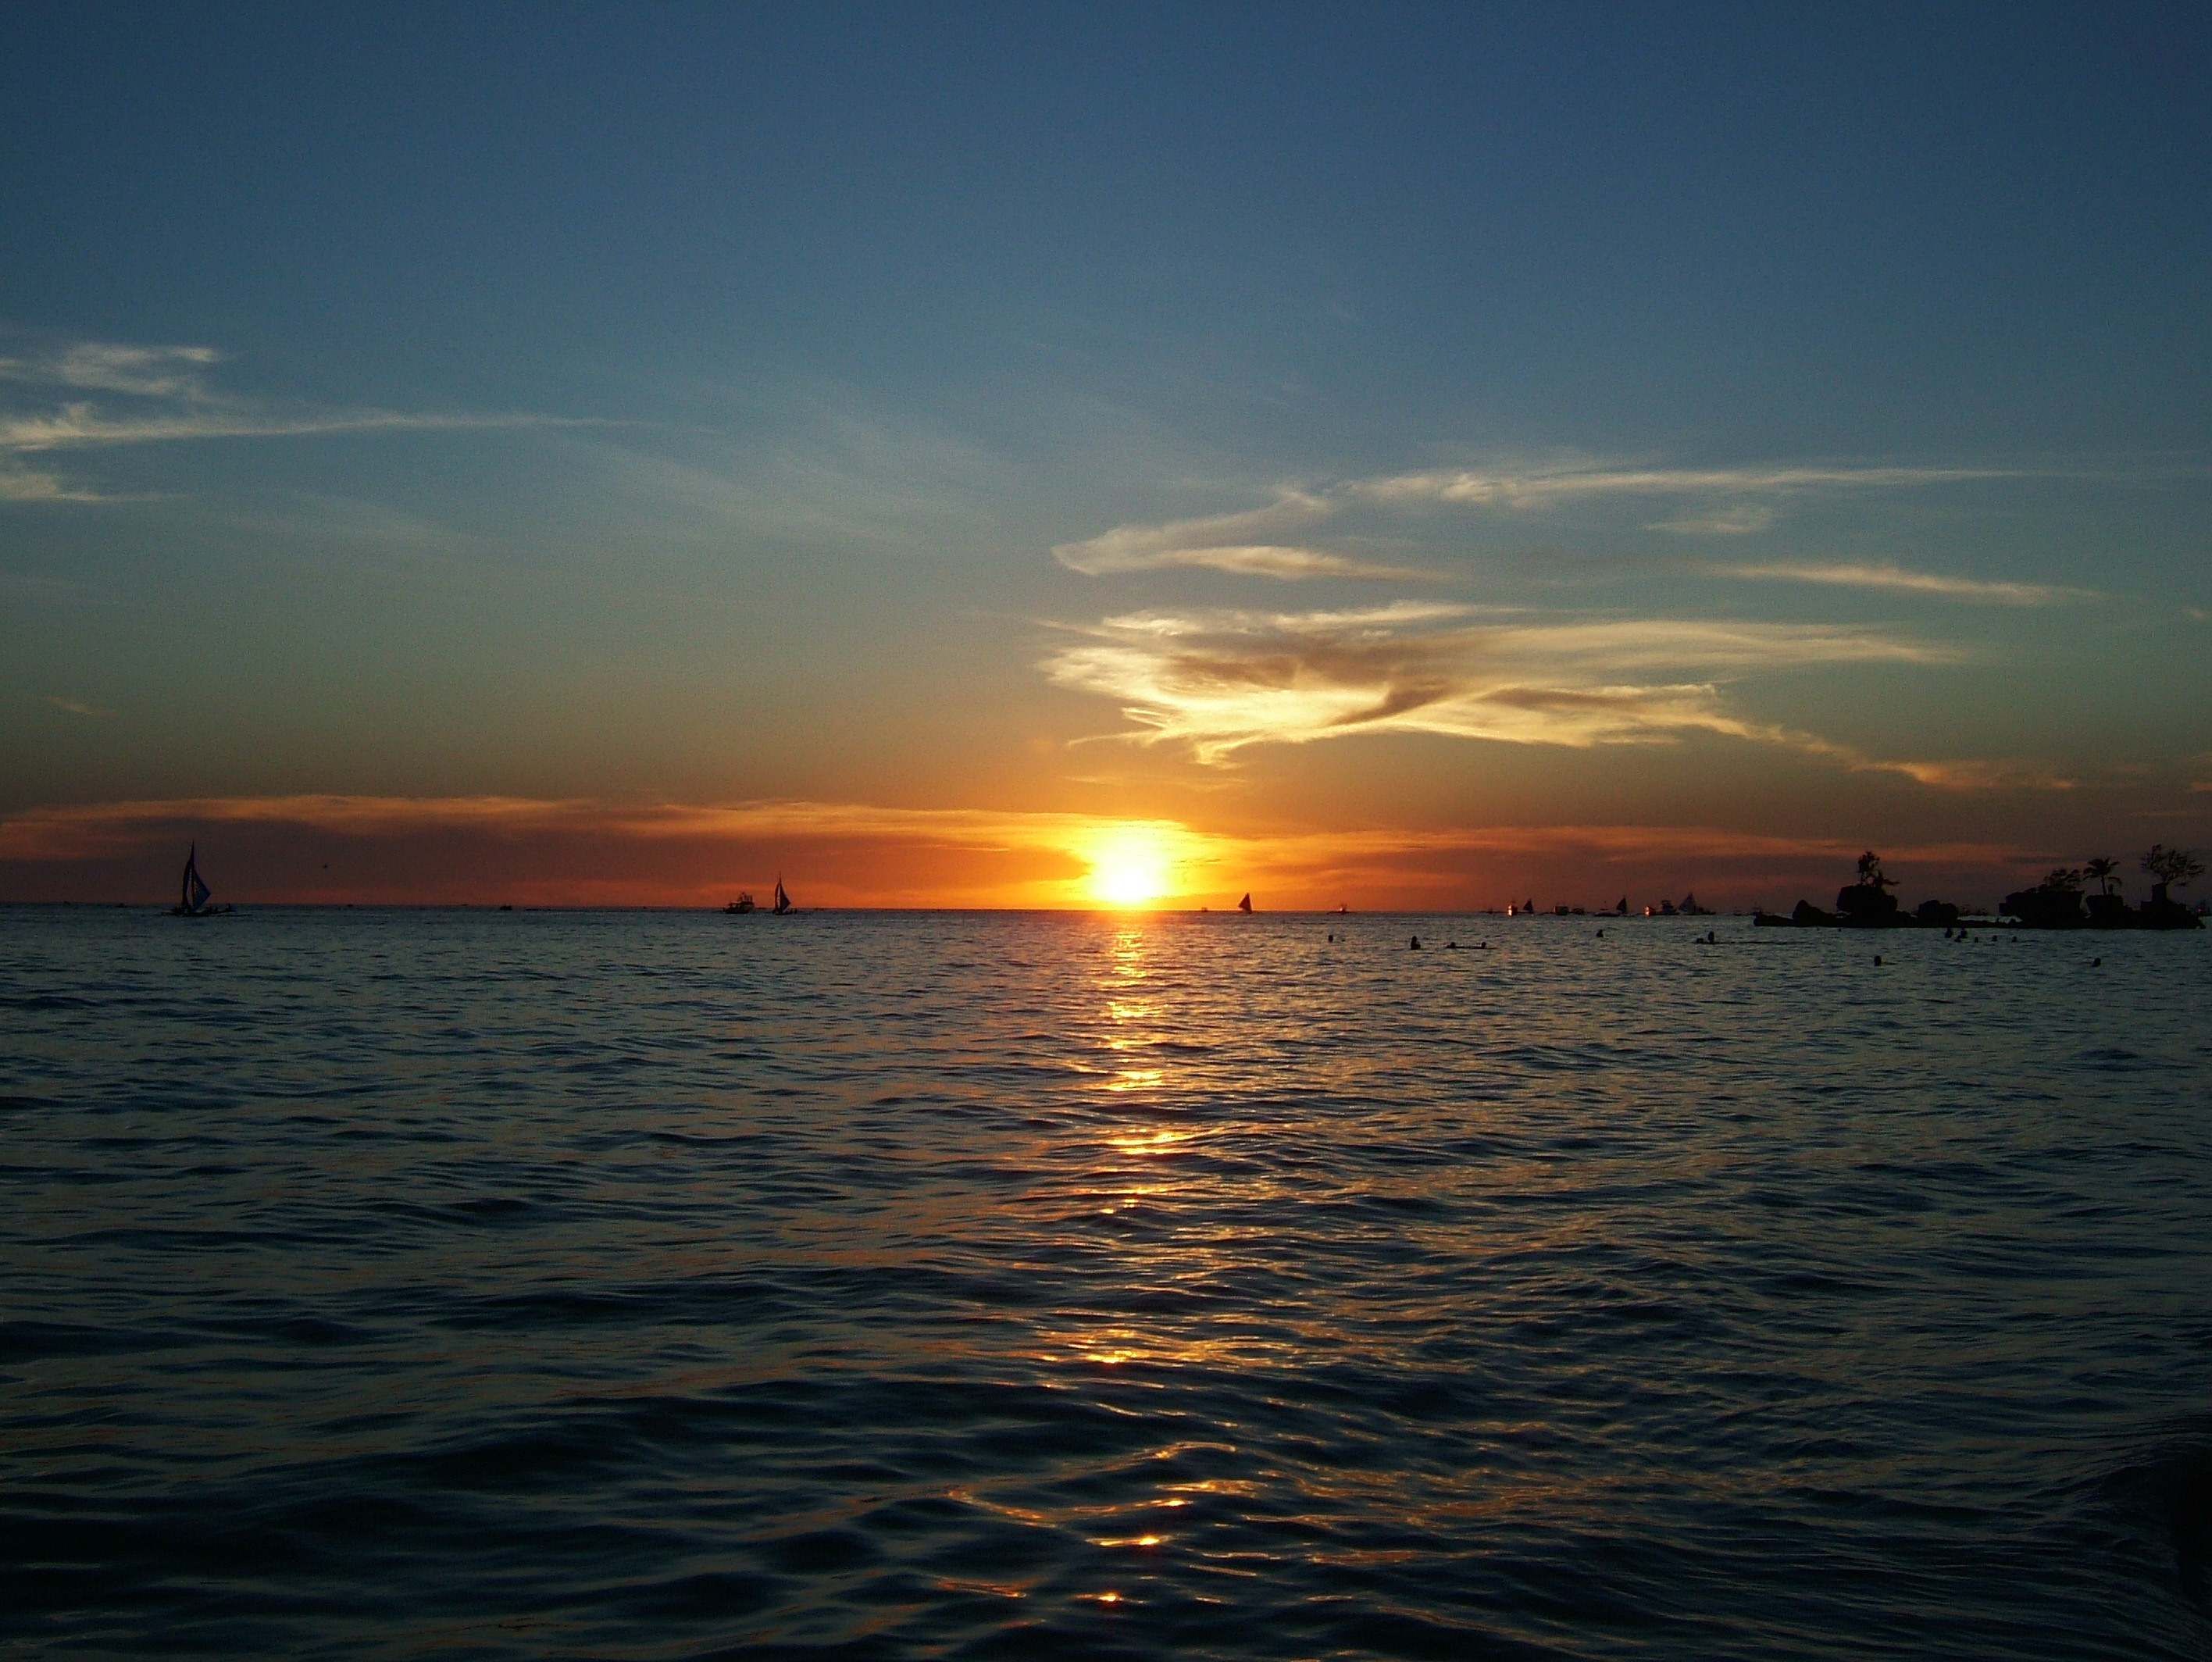 Sunset Philippines Boracay Beach 05